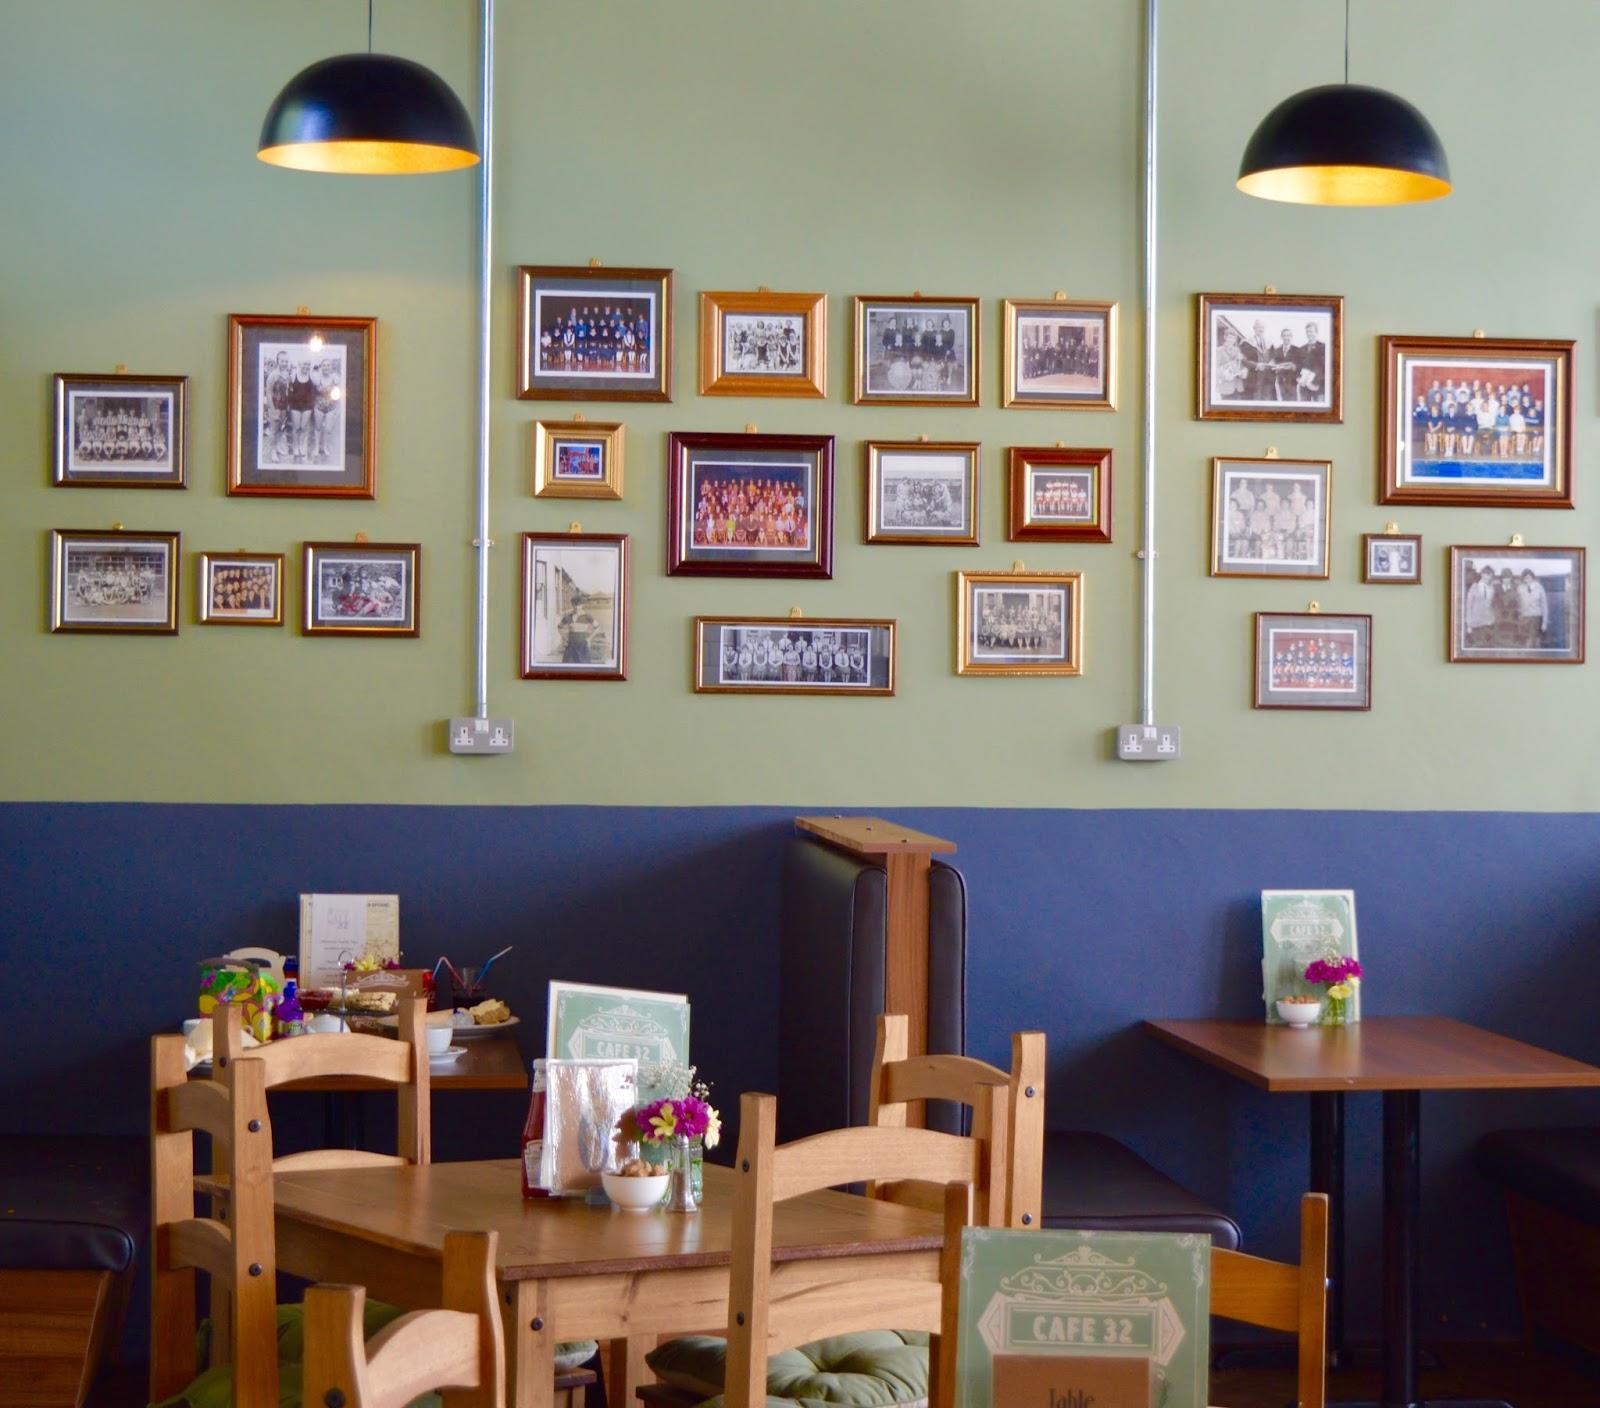 Cafe 32 | Linskill Centre, North Shields - A review - interior